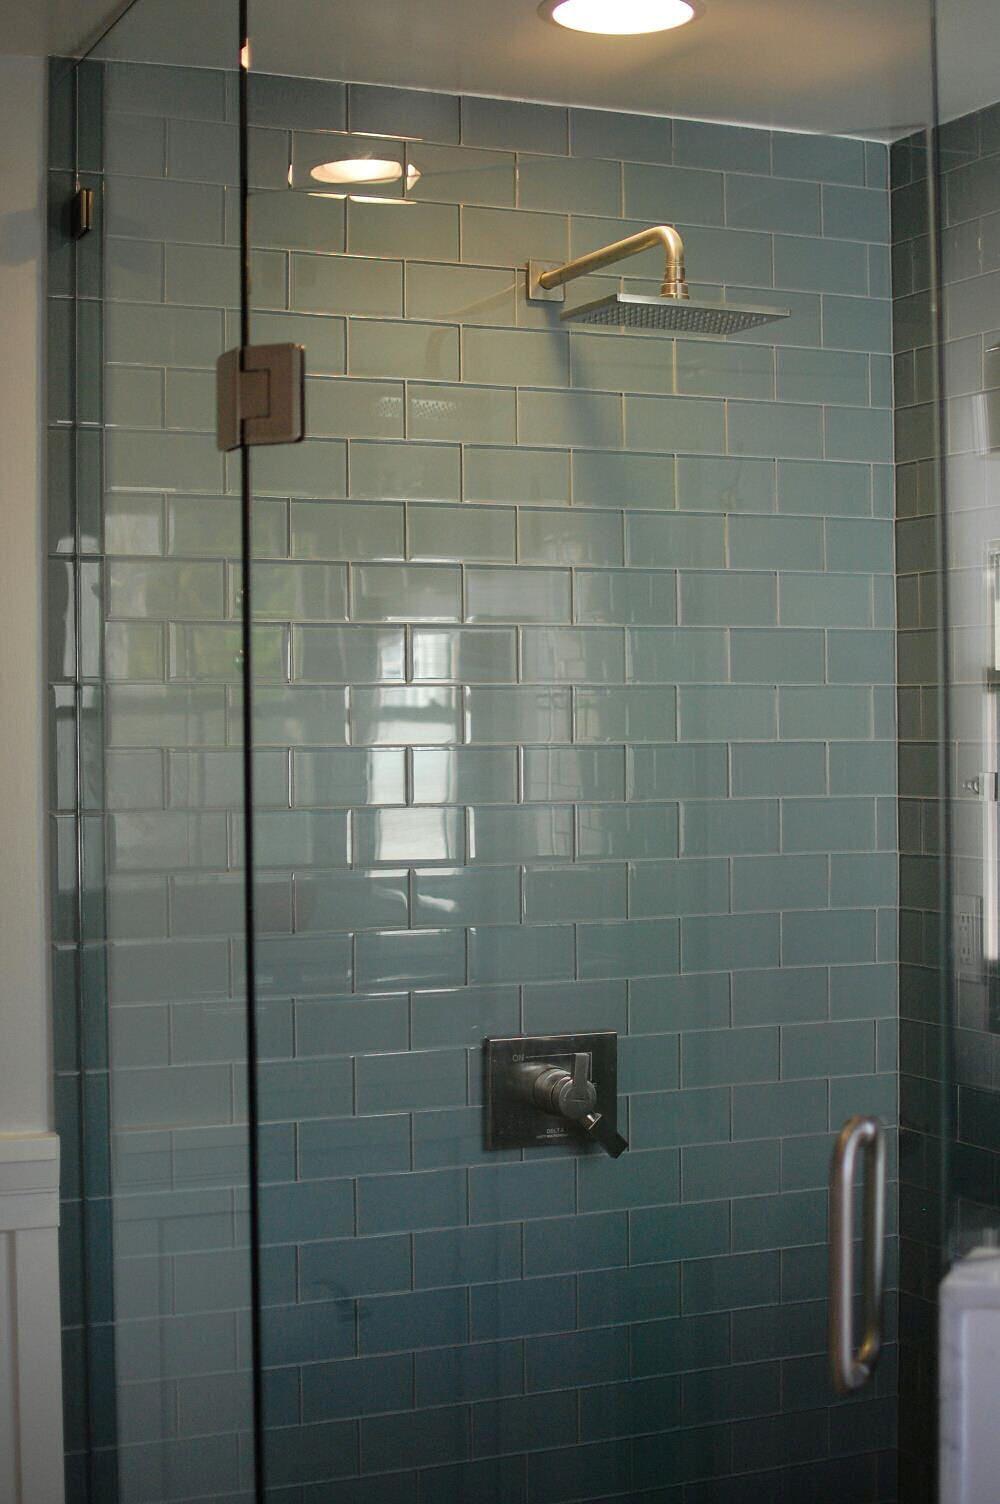 Ocean Glass Subway Tile Shower Found at bwaytileoutlet